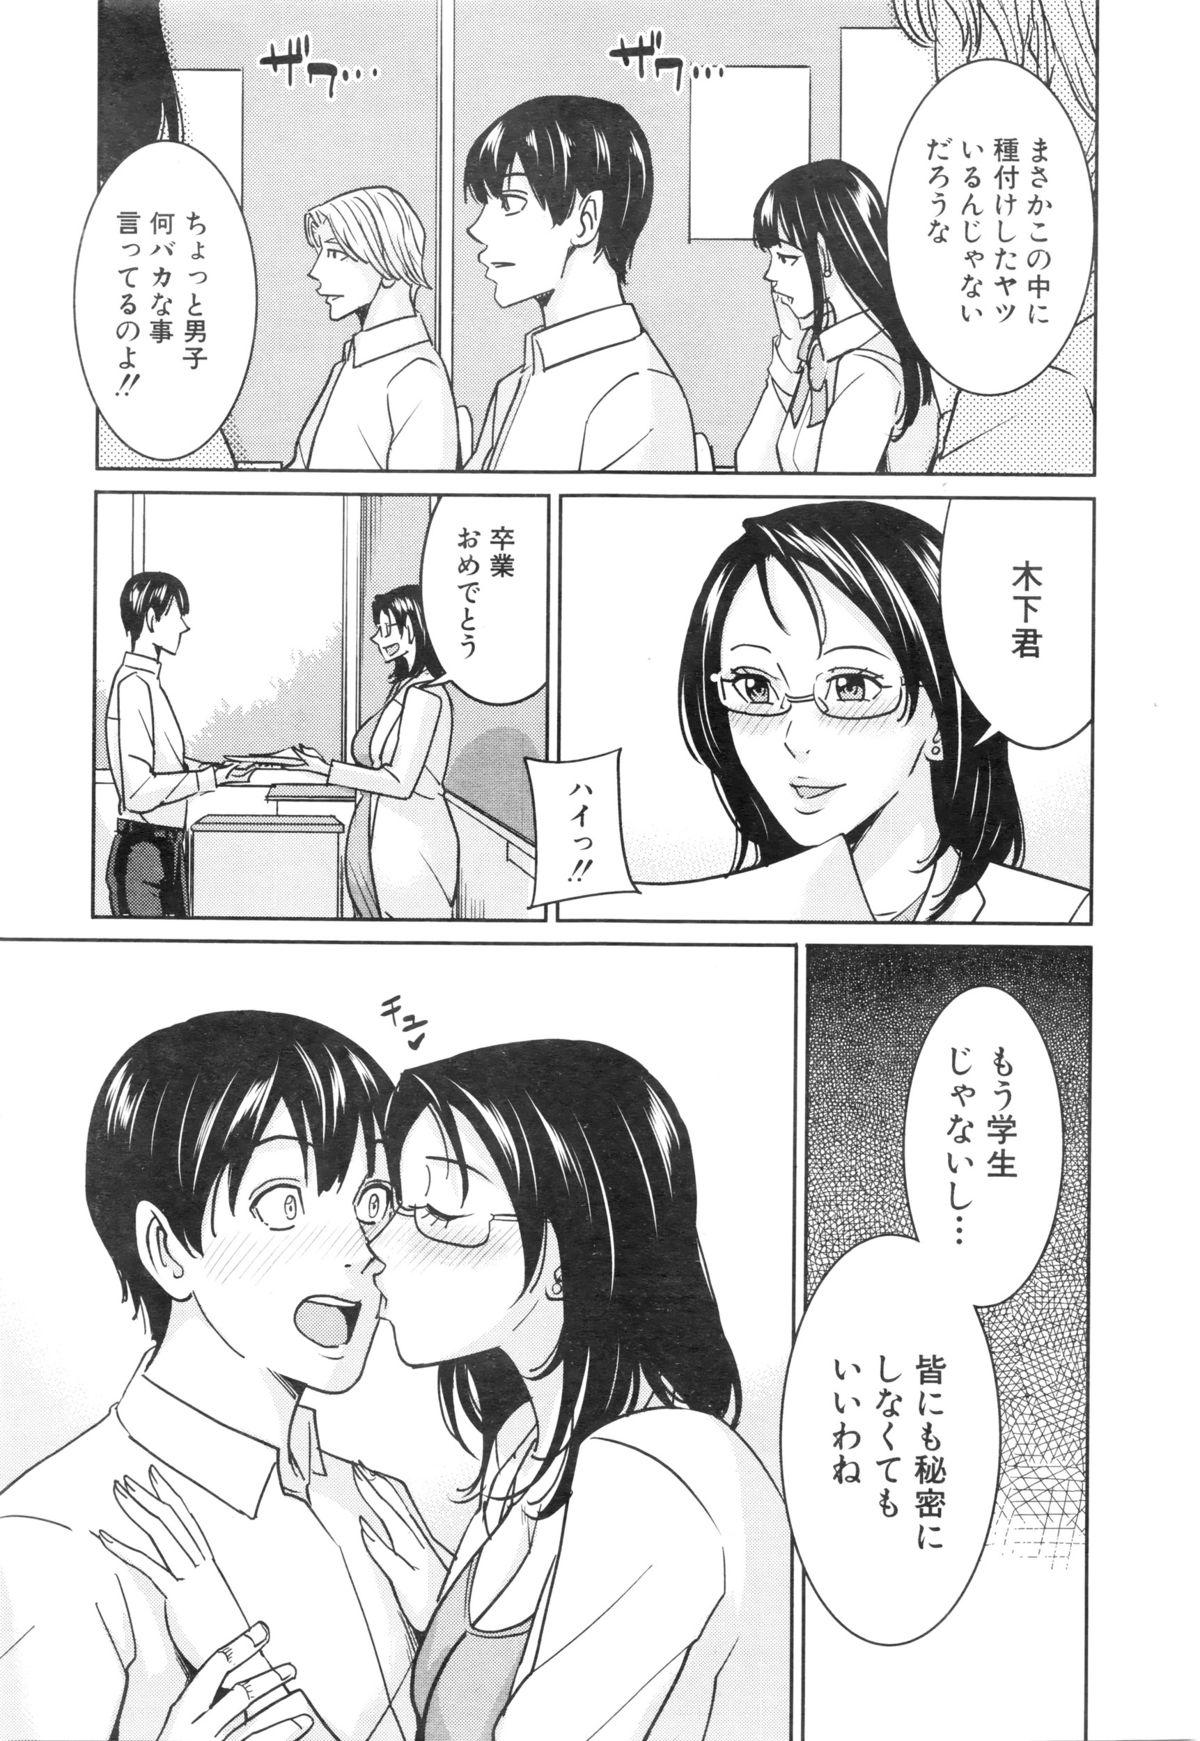 COMIC Mugen Tensei 2016-01 130